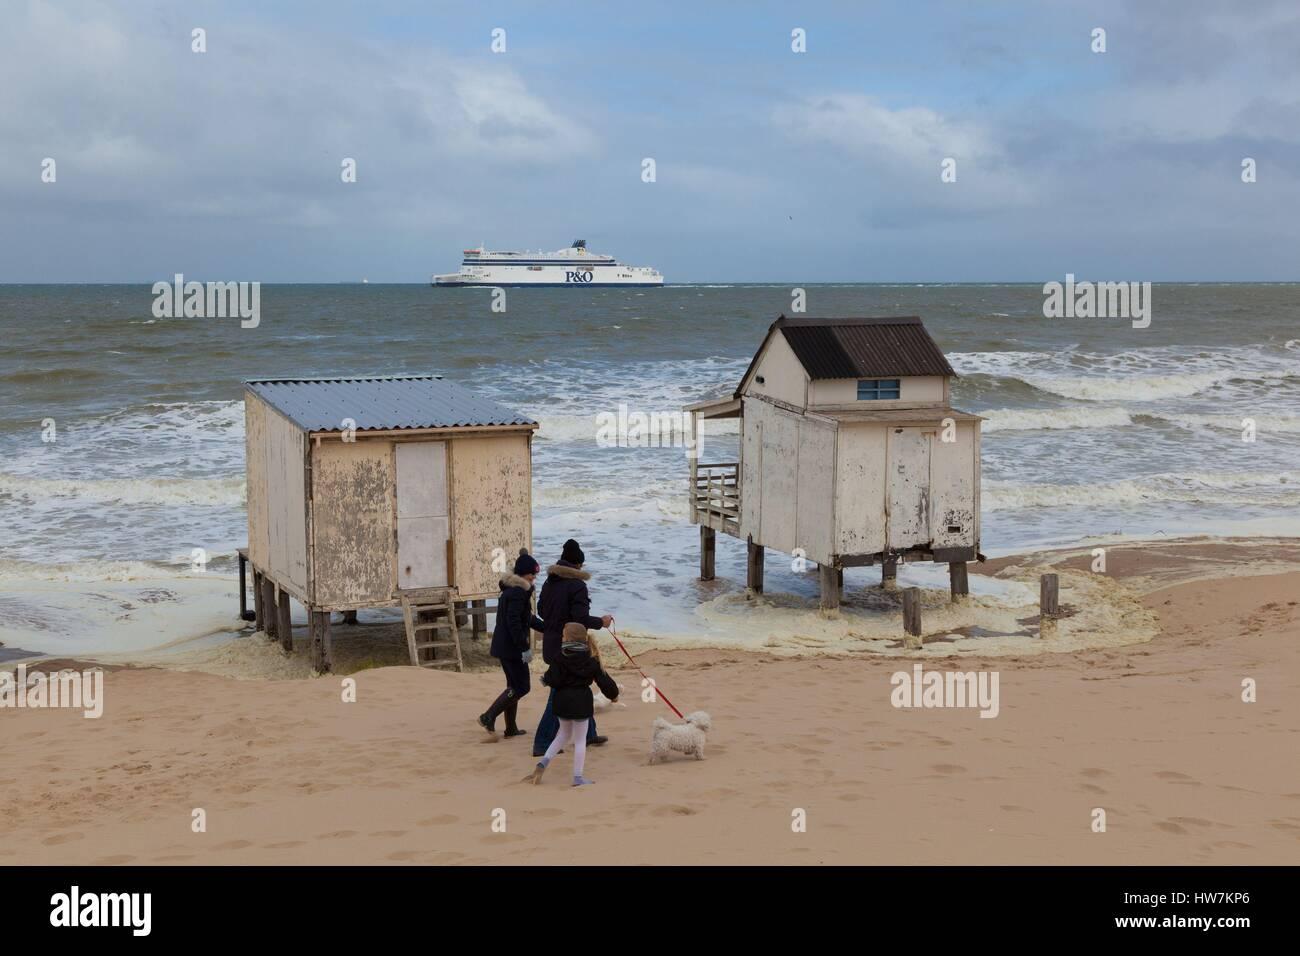 Francia, Pas de Calais Calais, cabañas de playa afectados por el mar durante las mareas altas Imagen De Stock